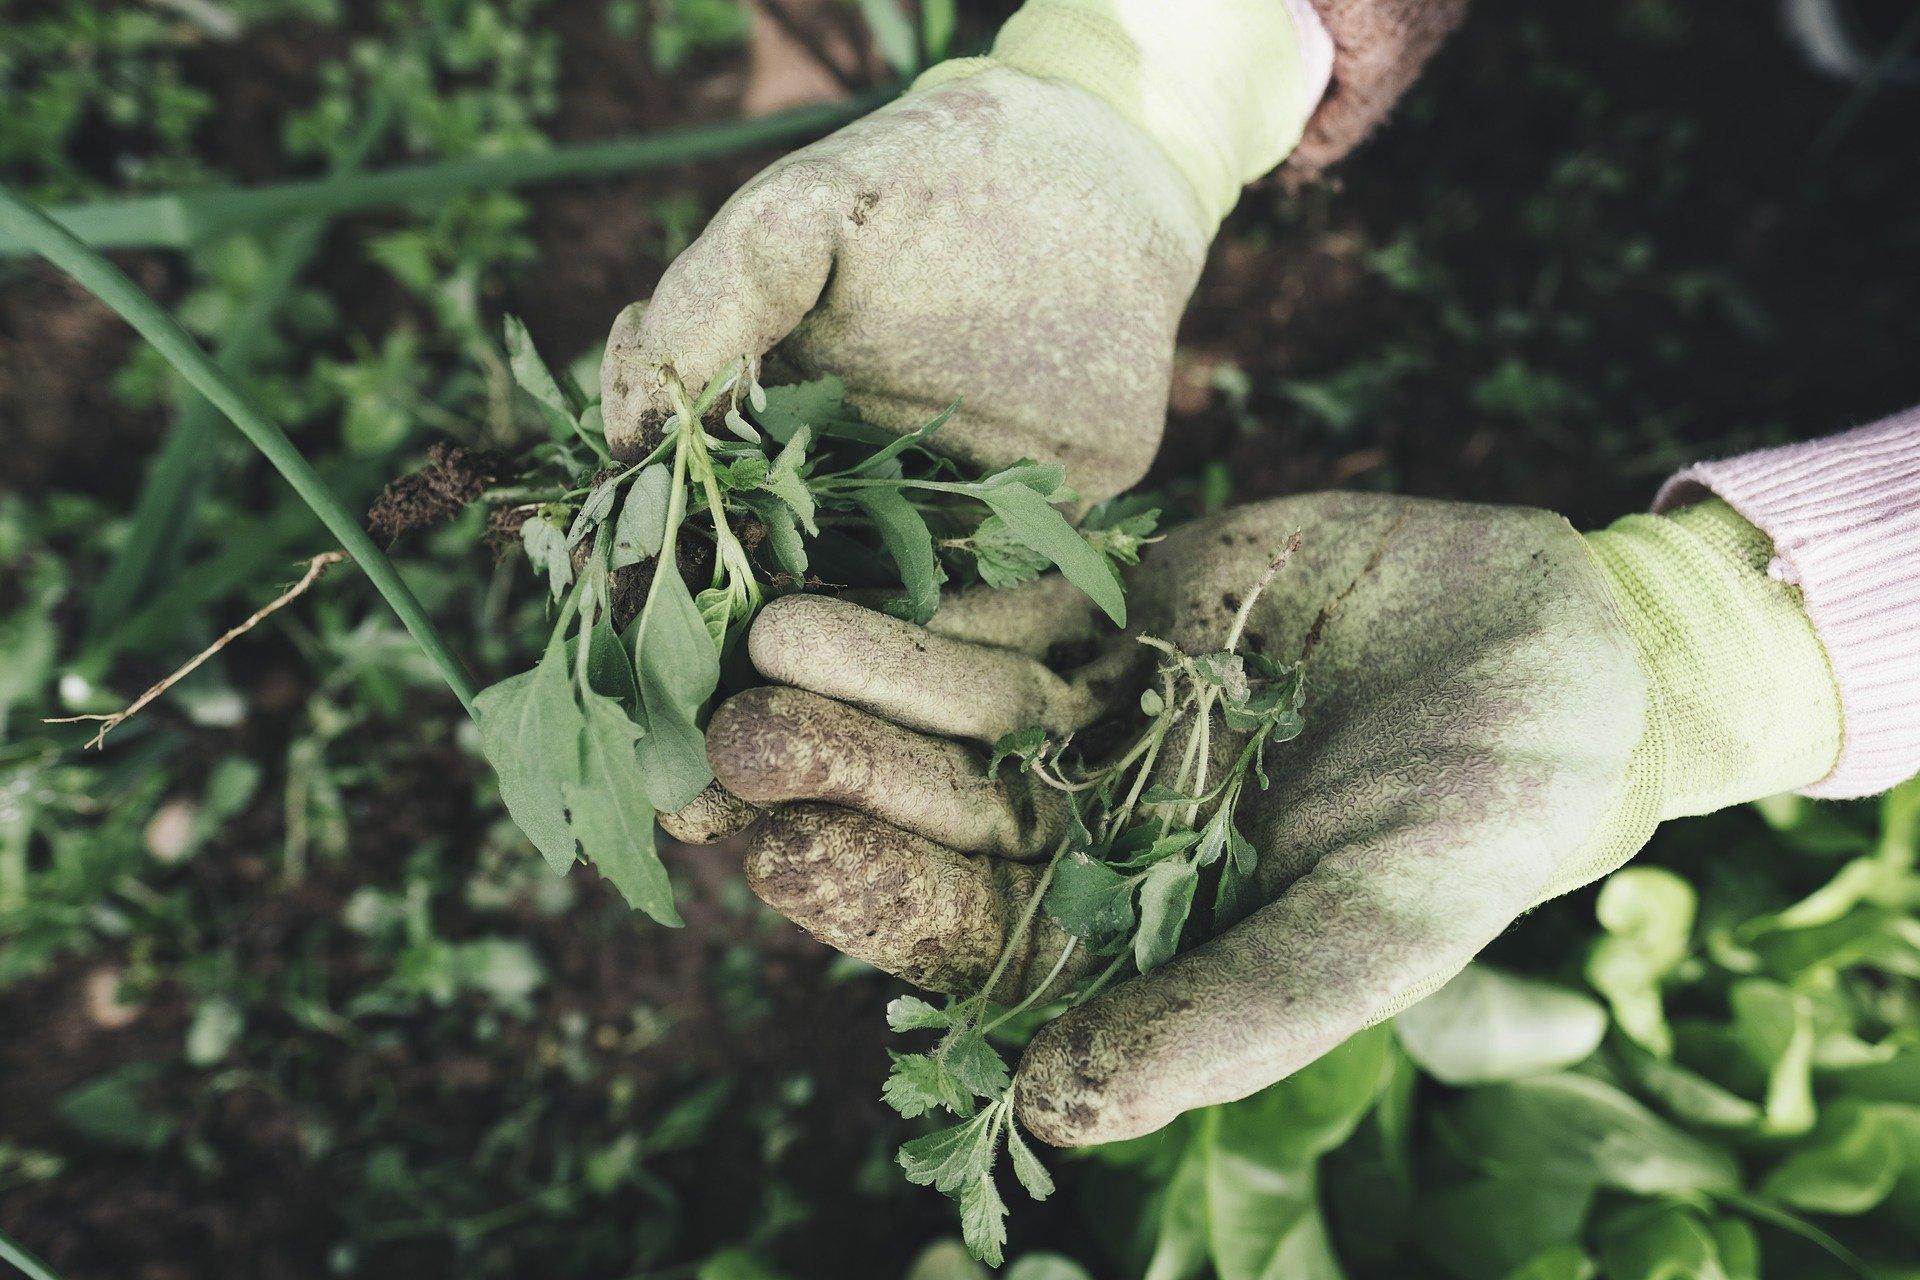 jardinage prévention blessures